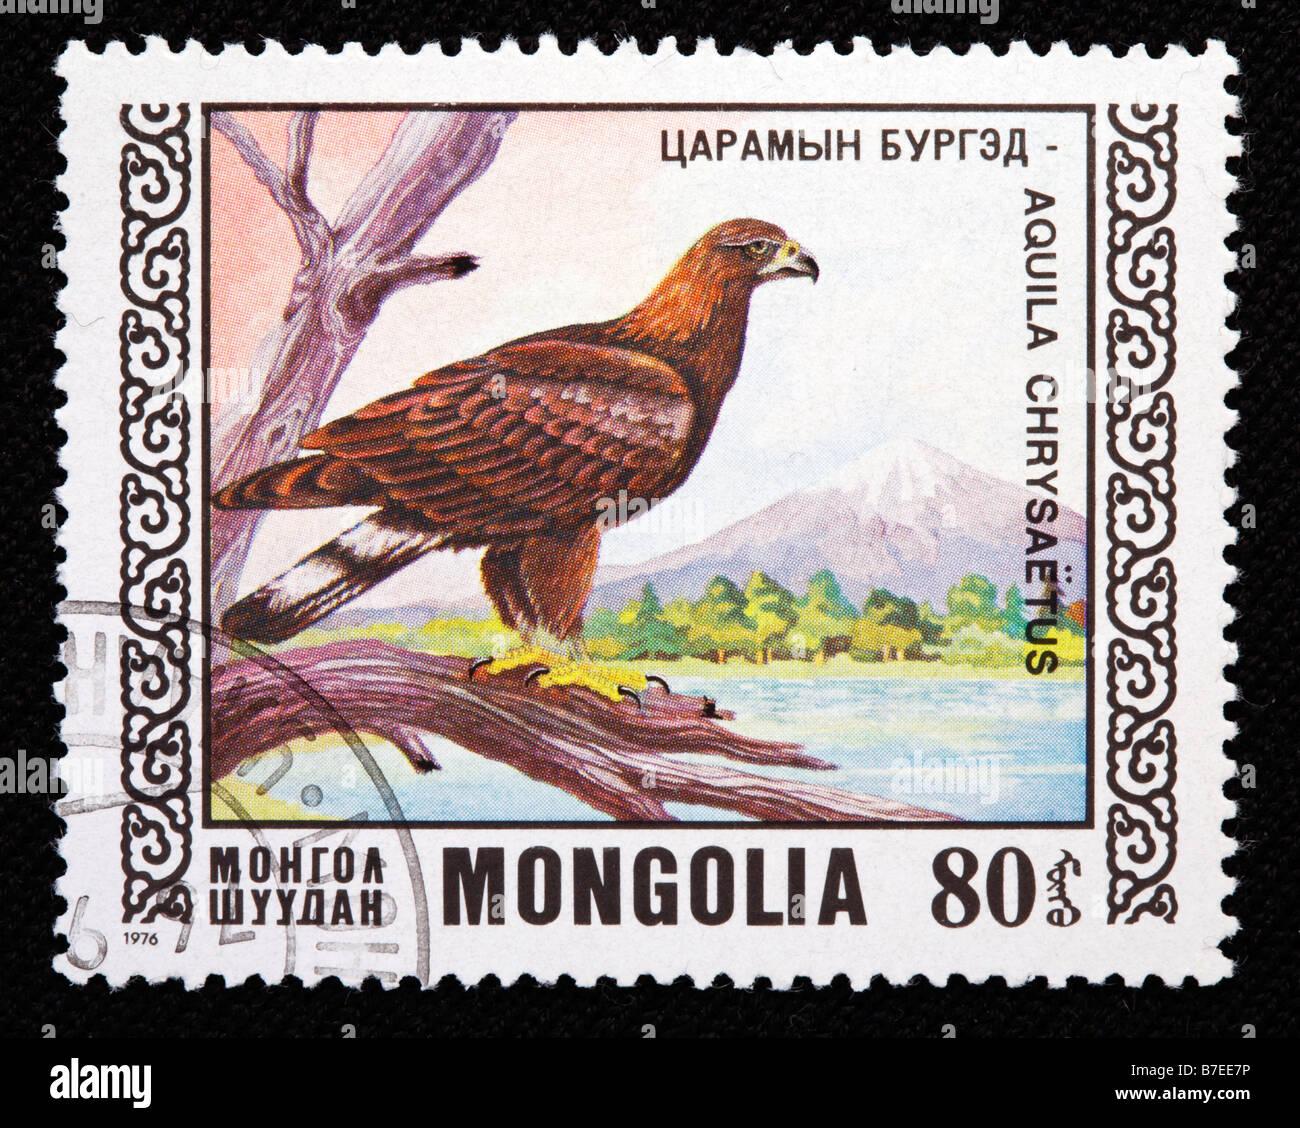 Golden Eagle, Aquila chrysaetos, Accipitridae, postage stamp, Mongolia, 1976 - Stock Image